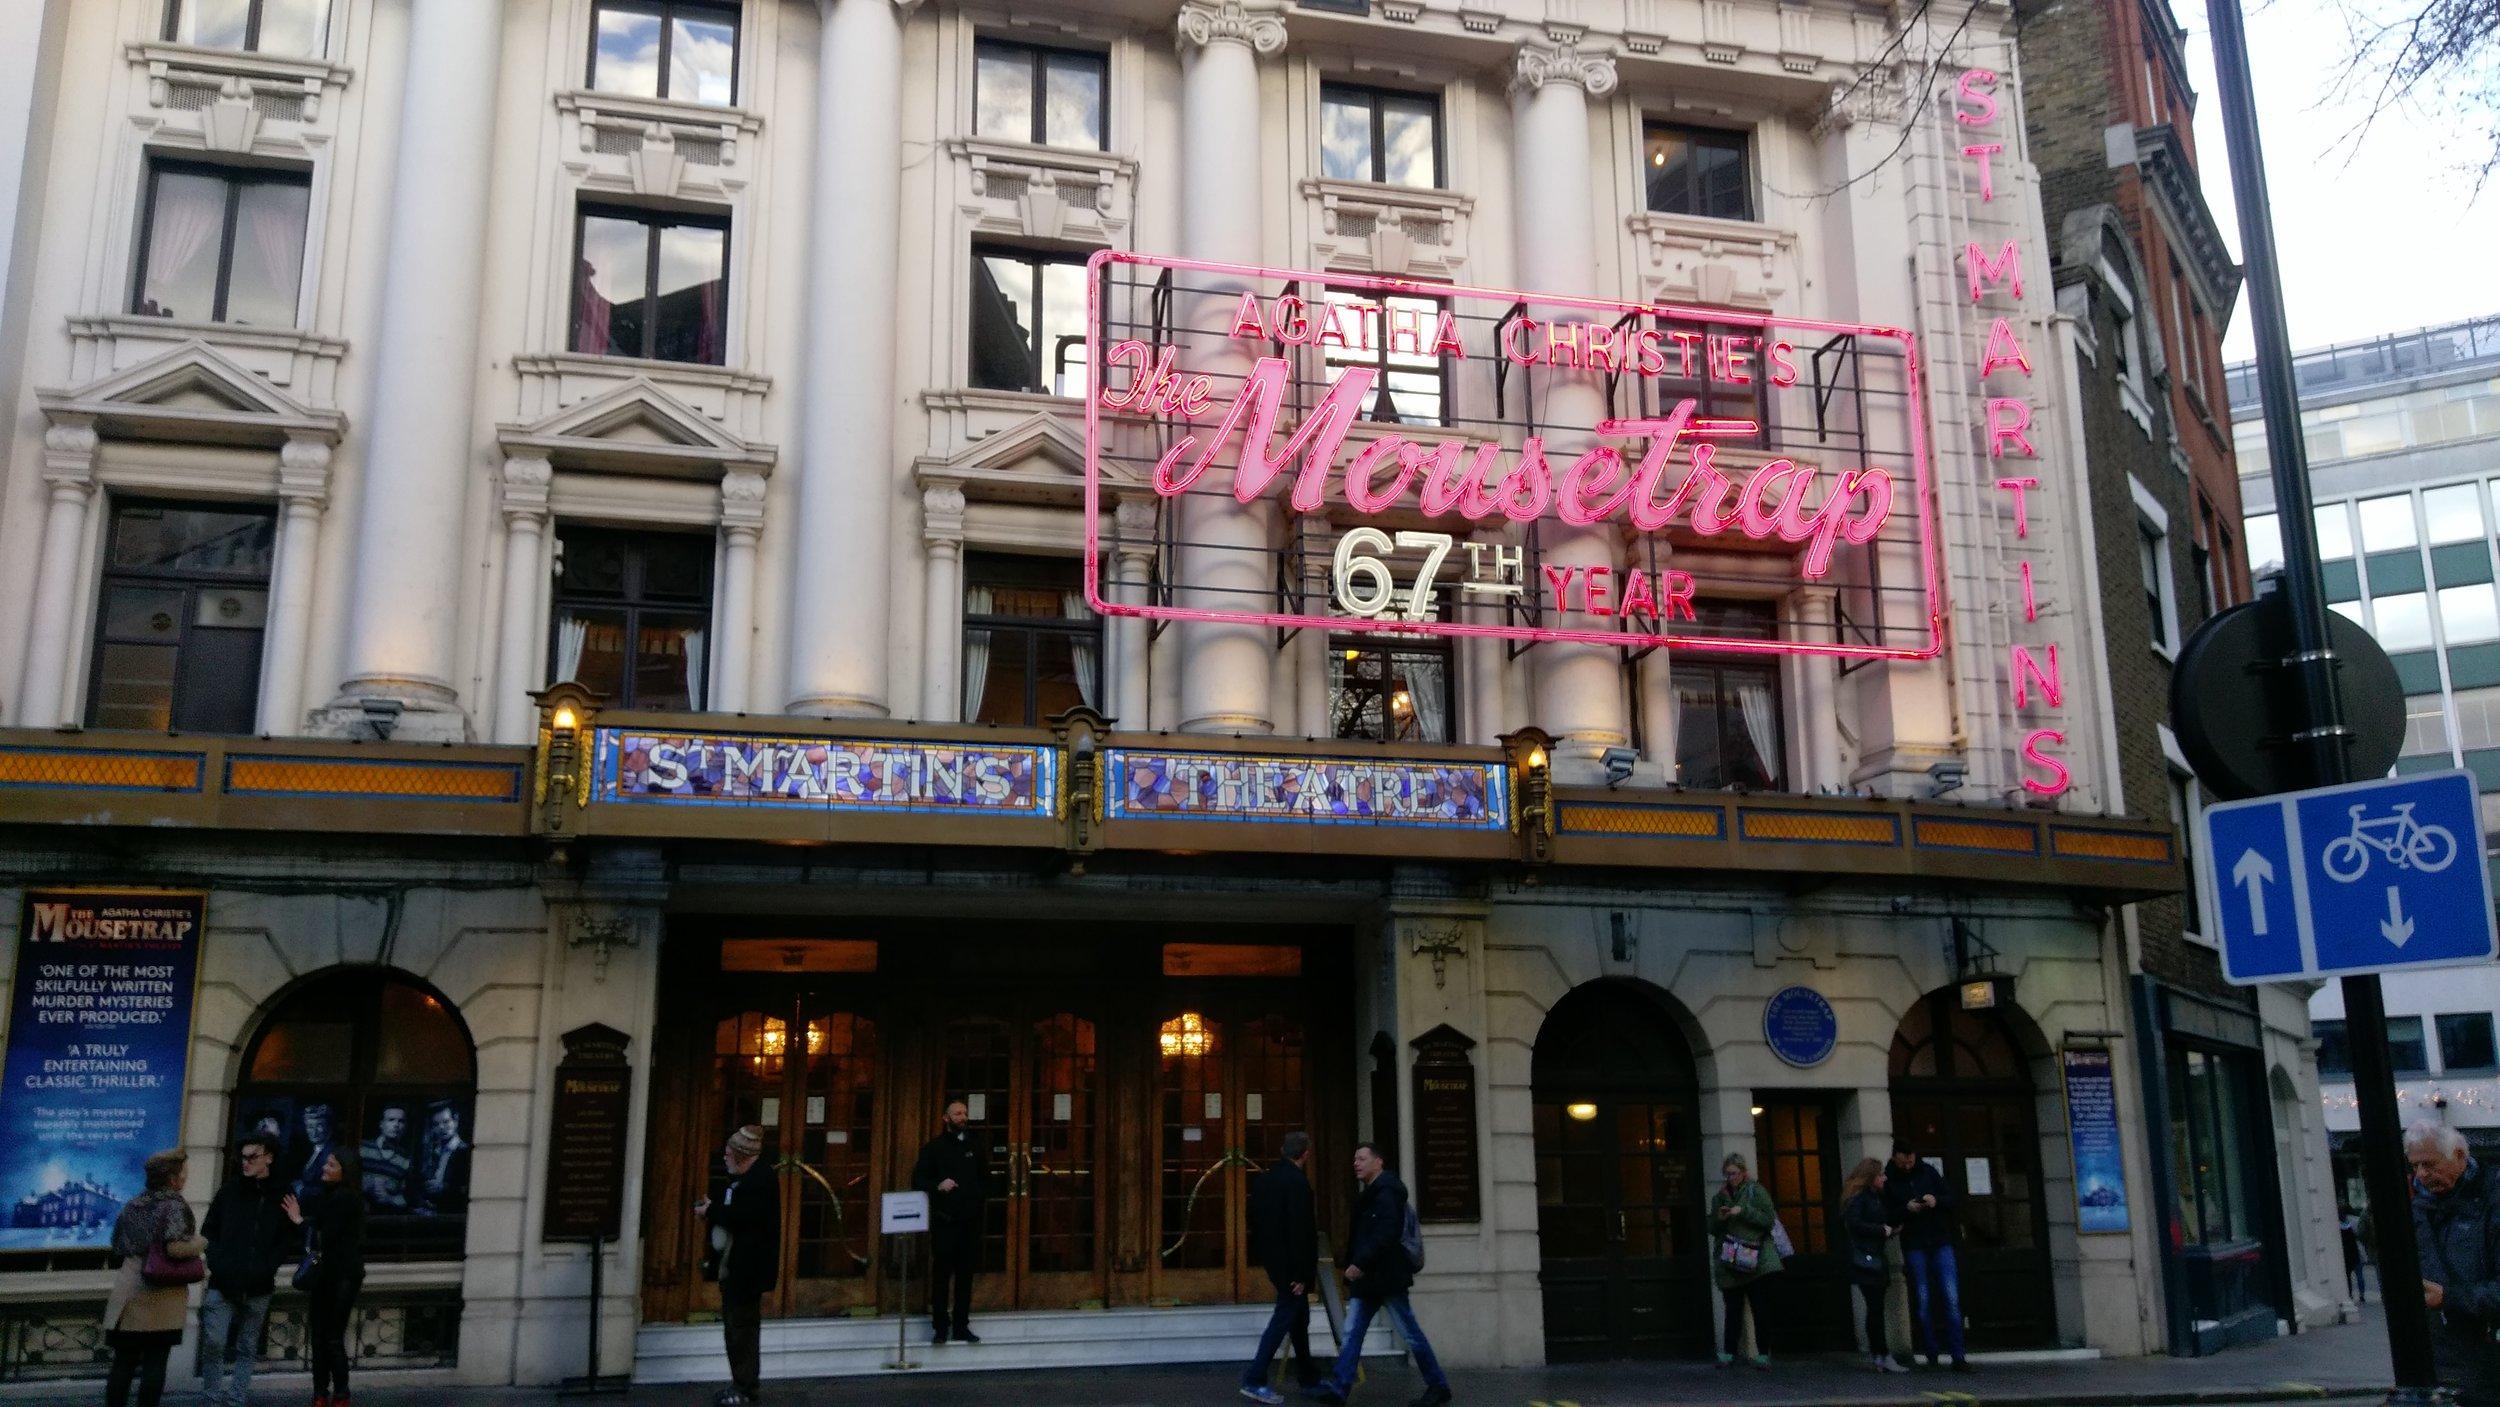 St Martin's Theatre - visited 01/01/2019